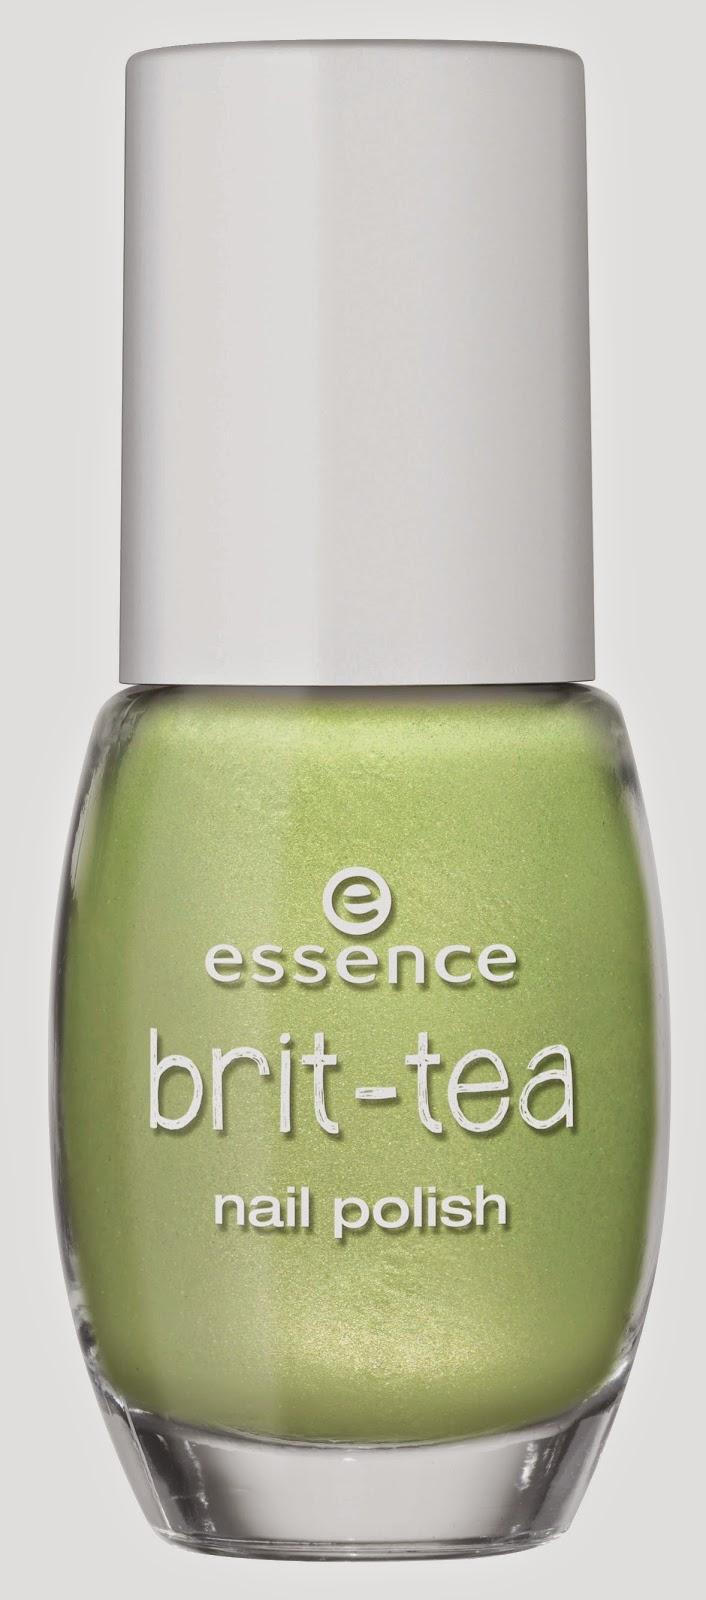 essence brit-tea – nail polish - www.annitschkasblog.de